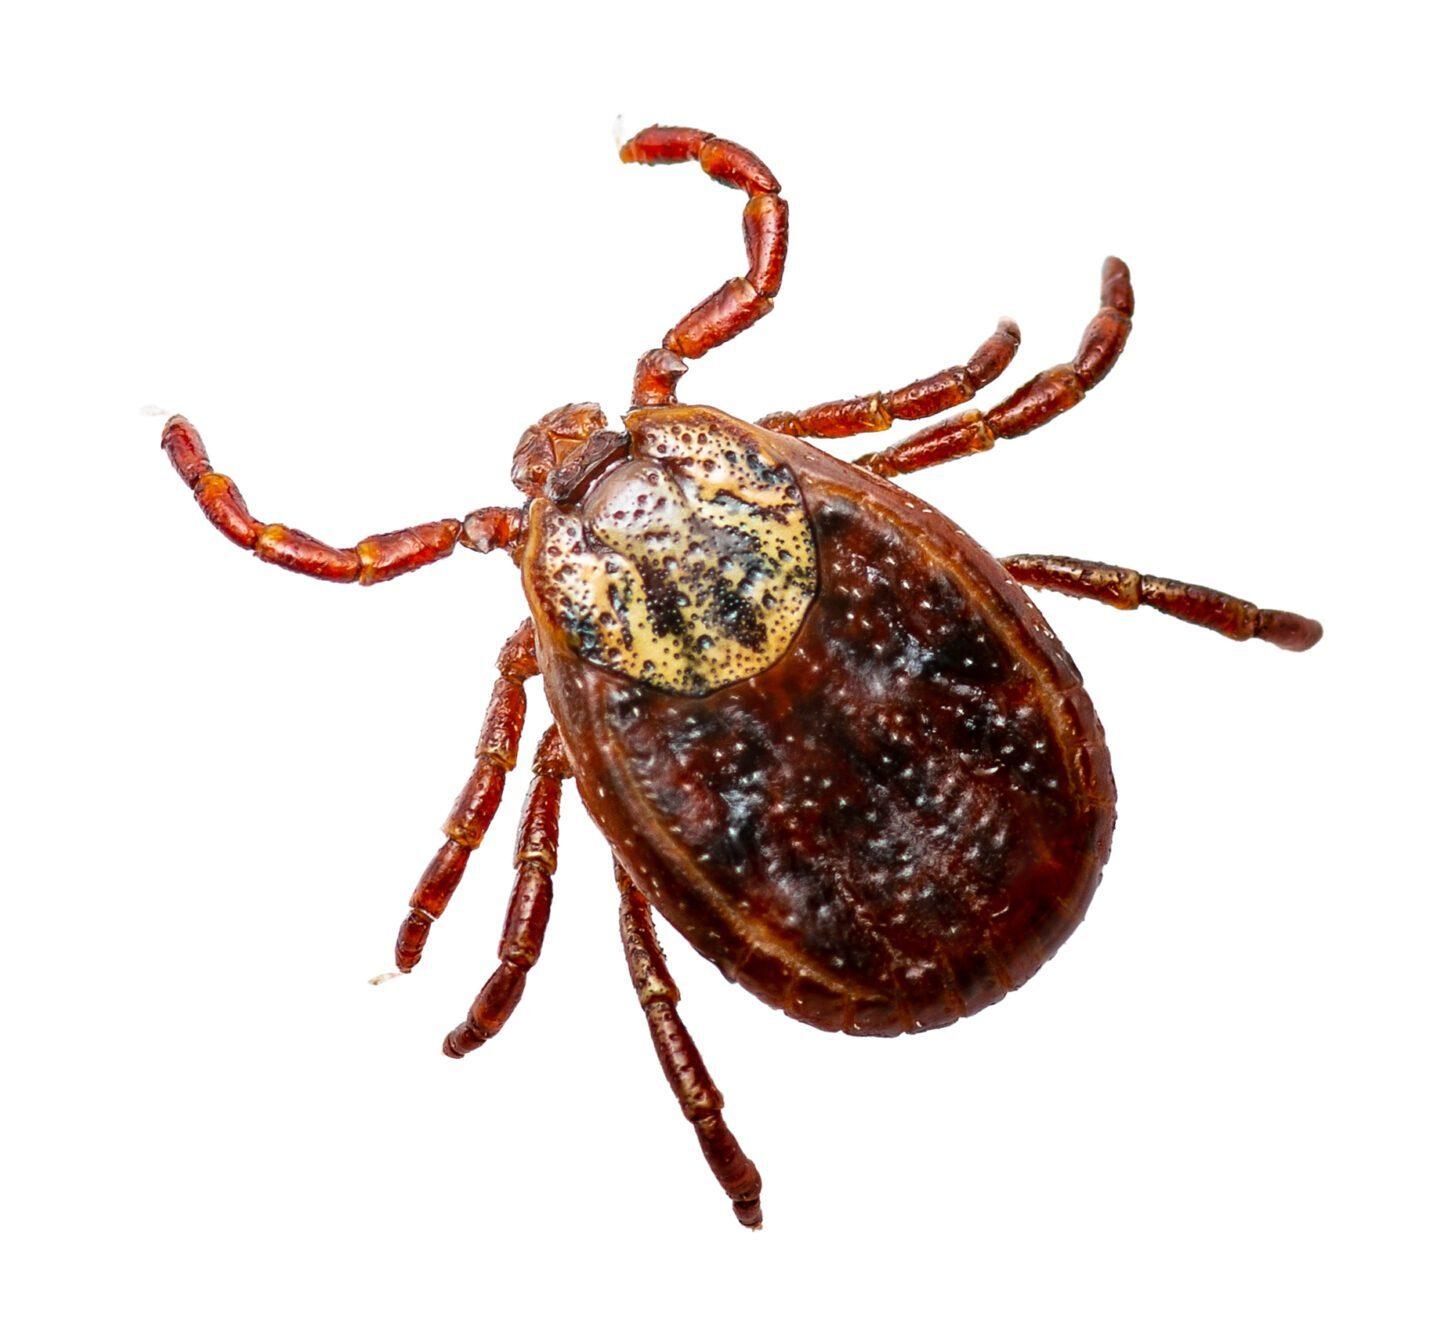 Pest Control Services - Tick Control, Mosquito Control, Chigger Control, and more - Preventative Pest Control in Nashville - Certified Pest Control